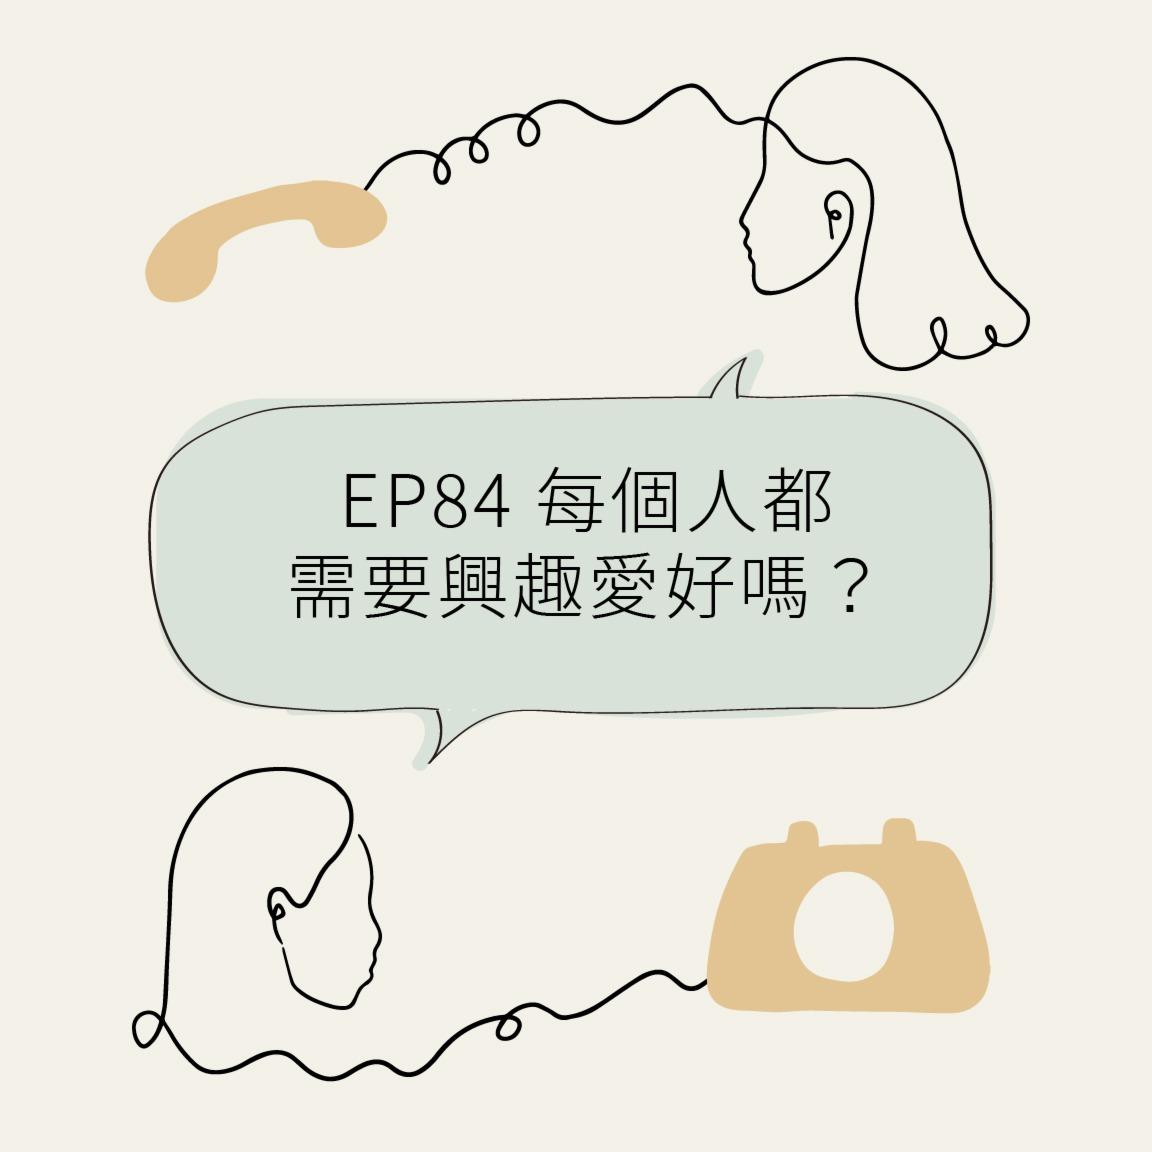 EP84 每个人都需要兴趣爱好吗?